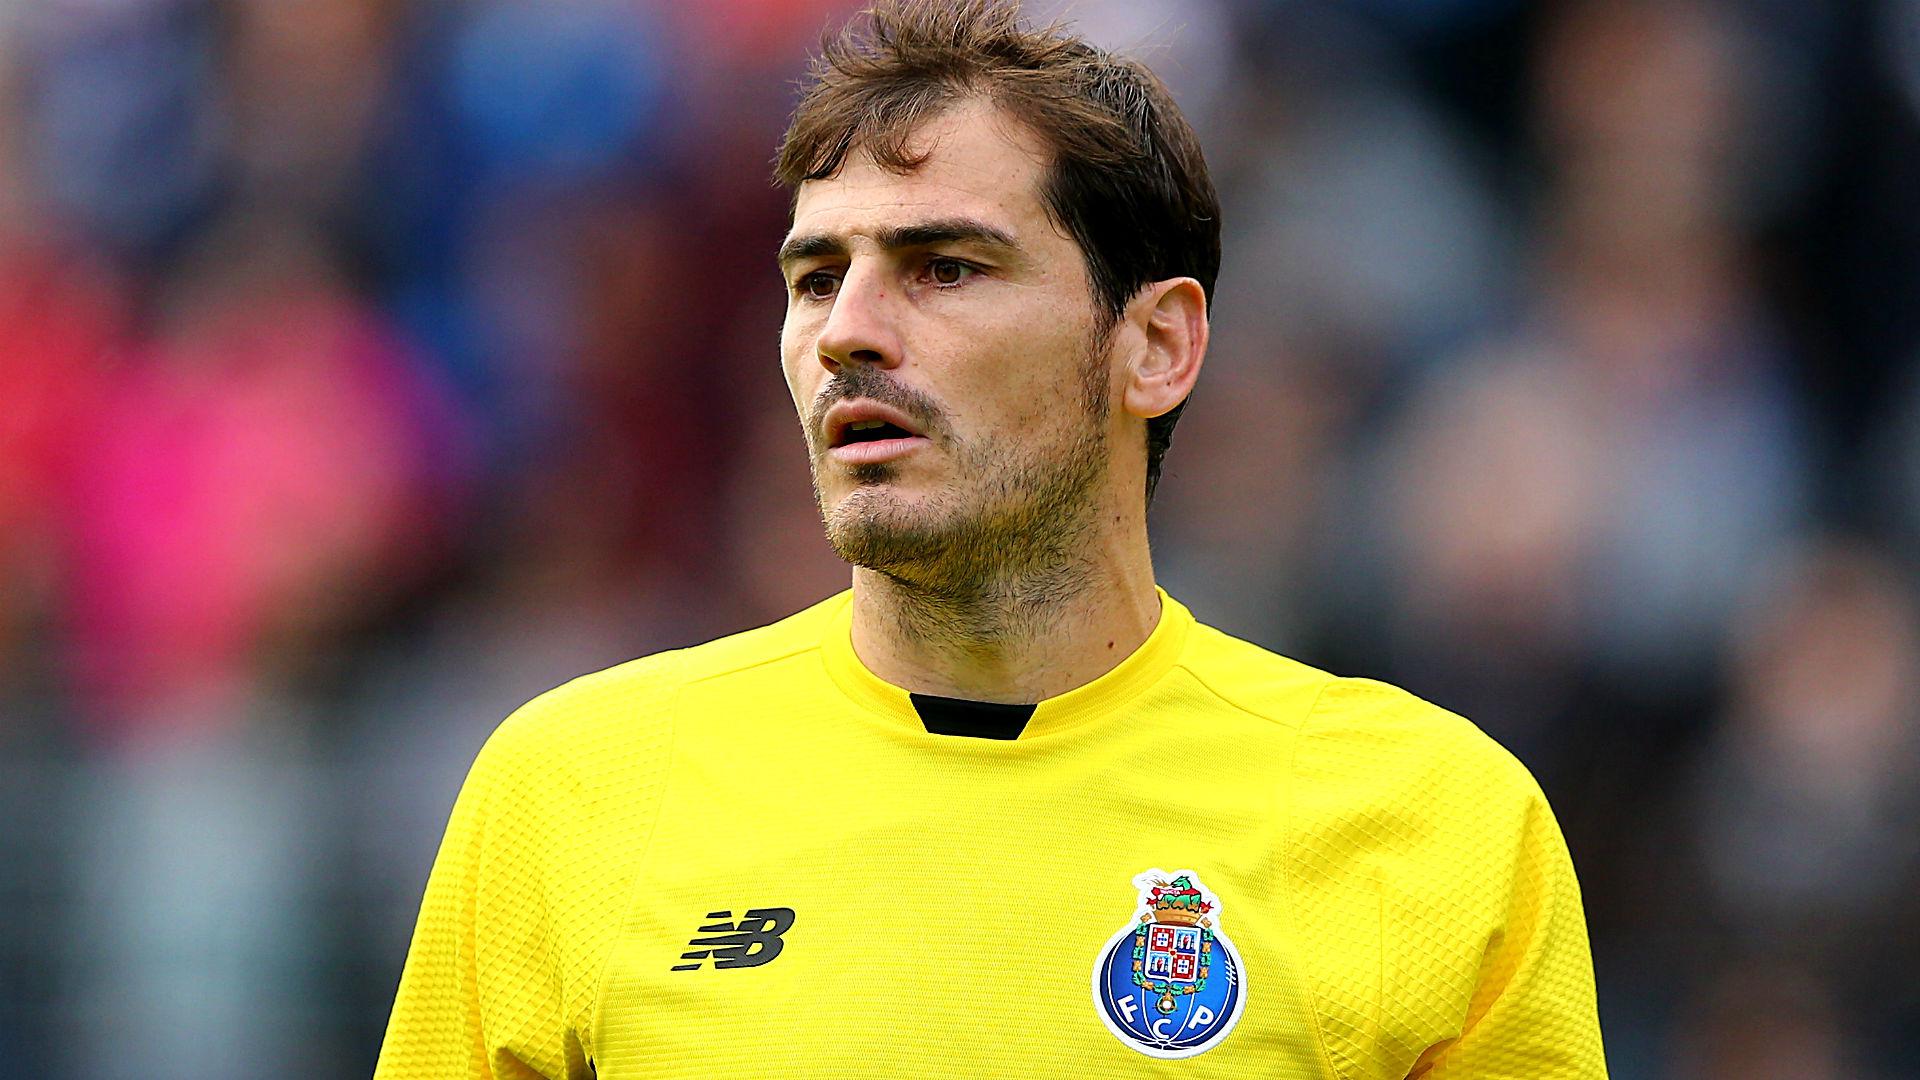 Iker Casillas, ispanyol futbolcu tarihte bugün